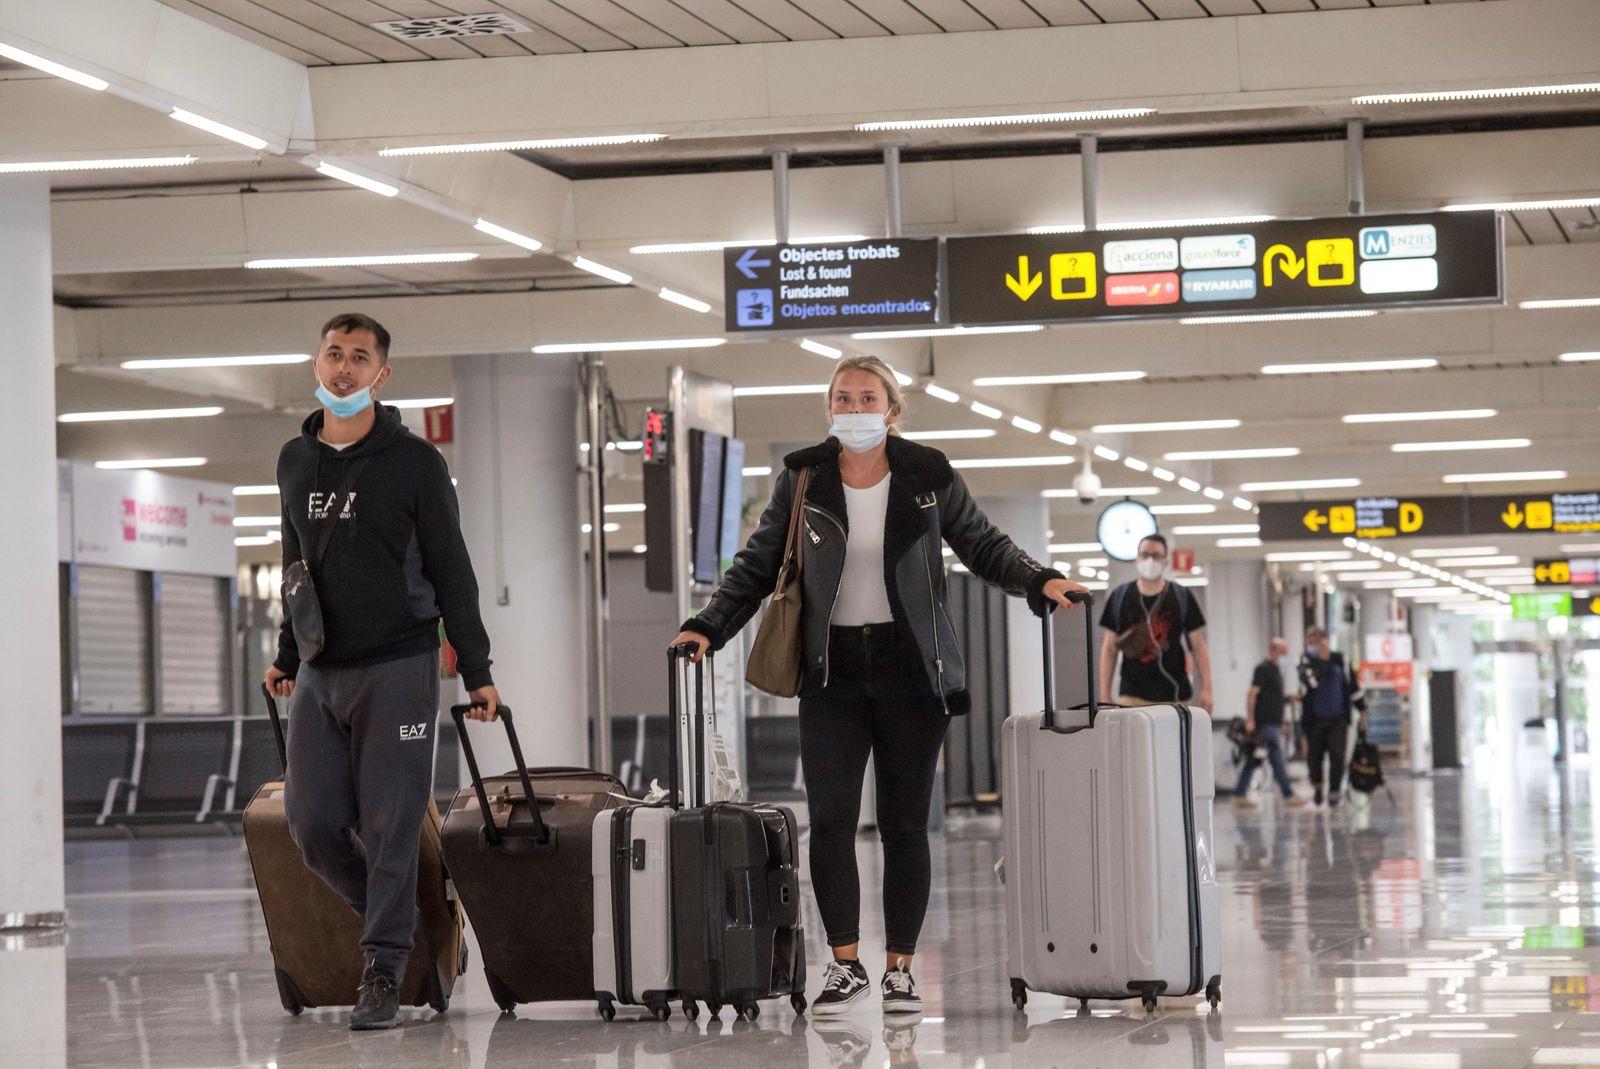 Balearics reaches the last phase of coronavirus lockdown exit process, Palma, Spain - 08 Jun 2020